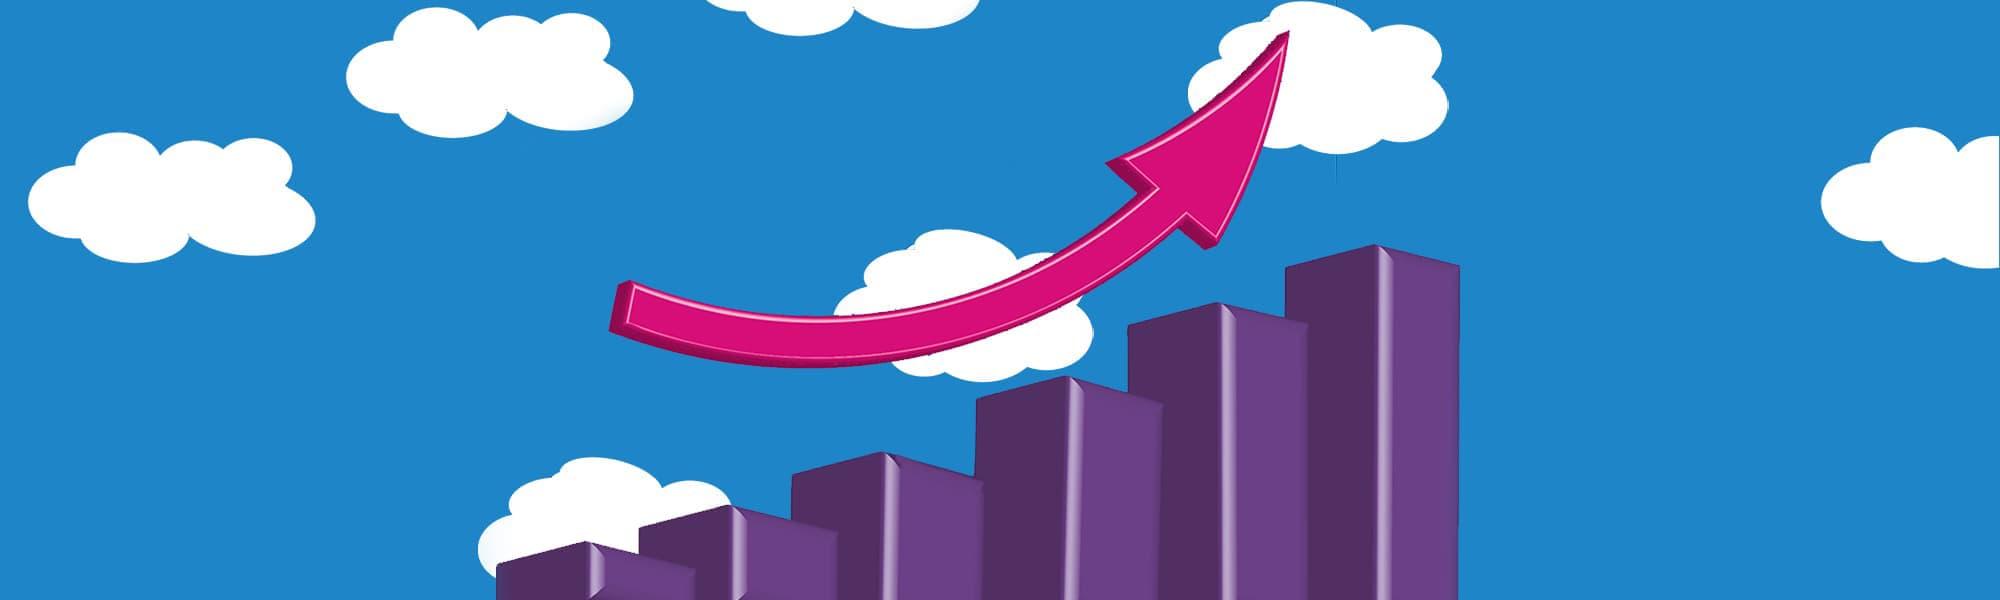 pink upward arrow pointing to top of rising purple diagram.jpg